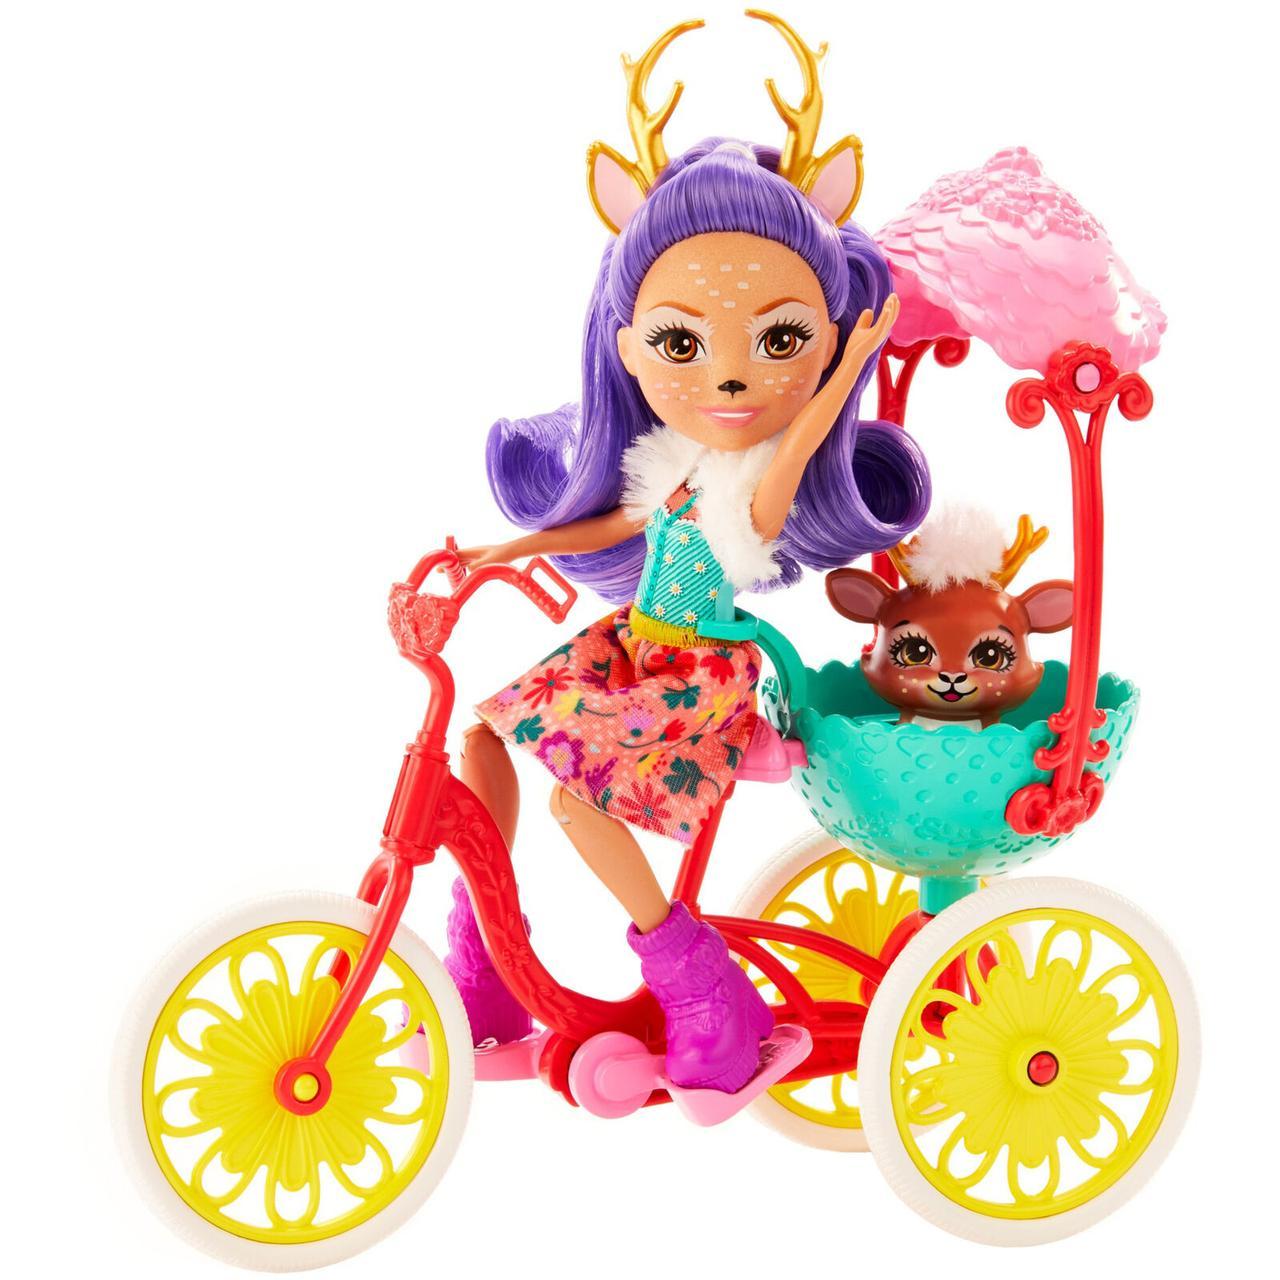 Enchantimals Енчантималс Данесса на велосипеде Bicycle Friends Playset with Danessa Deer Doll mattel GJX30